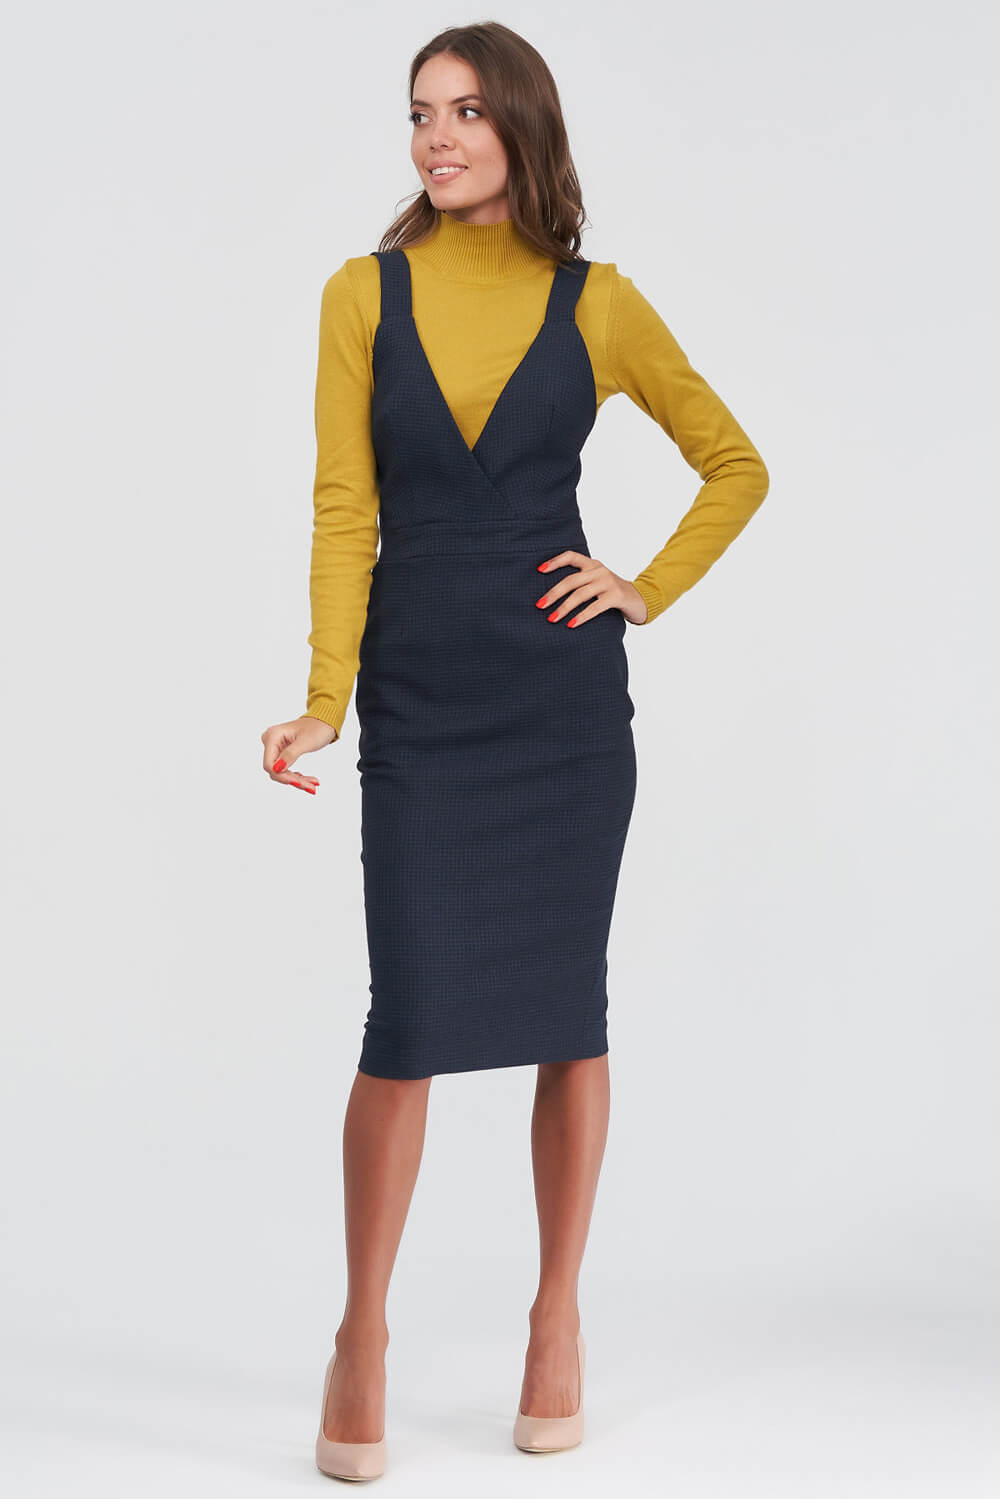 Сарафан женские Natali Bolgar модель 19028MAD294 , 2017